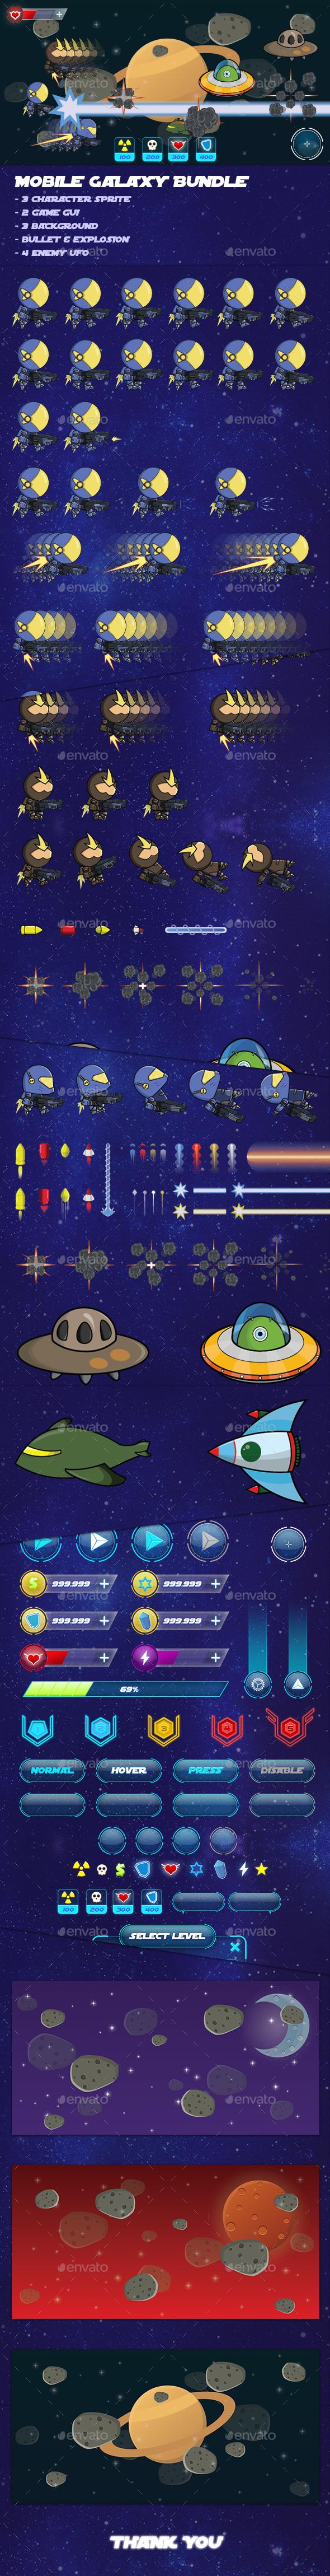 Galaxy Bundle - Game Assets